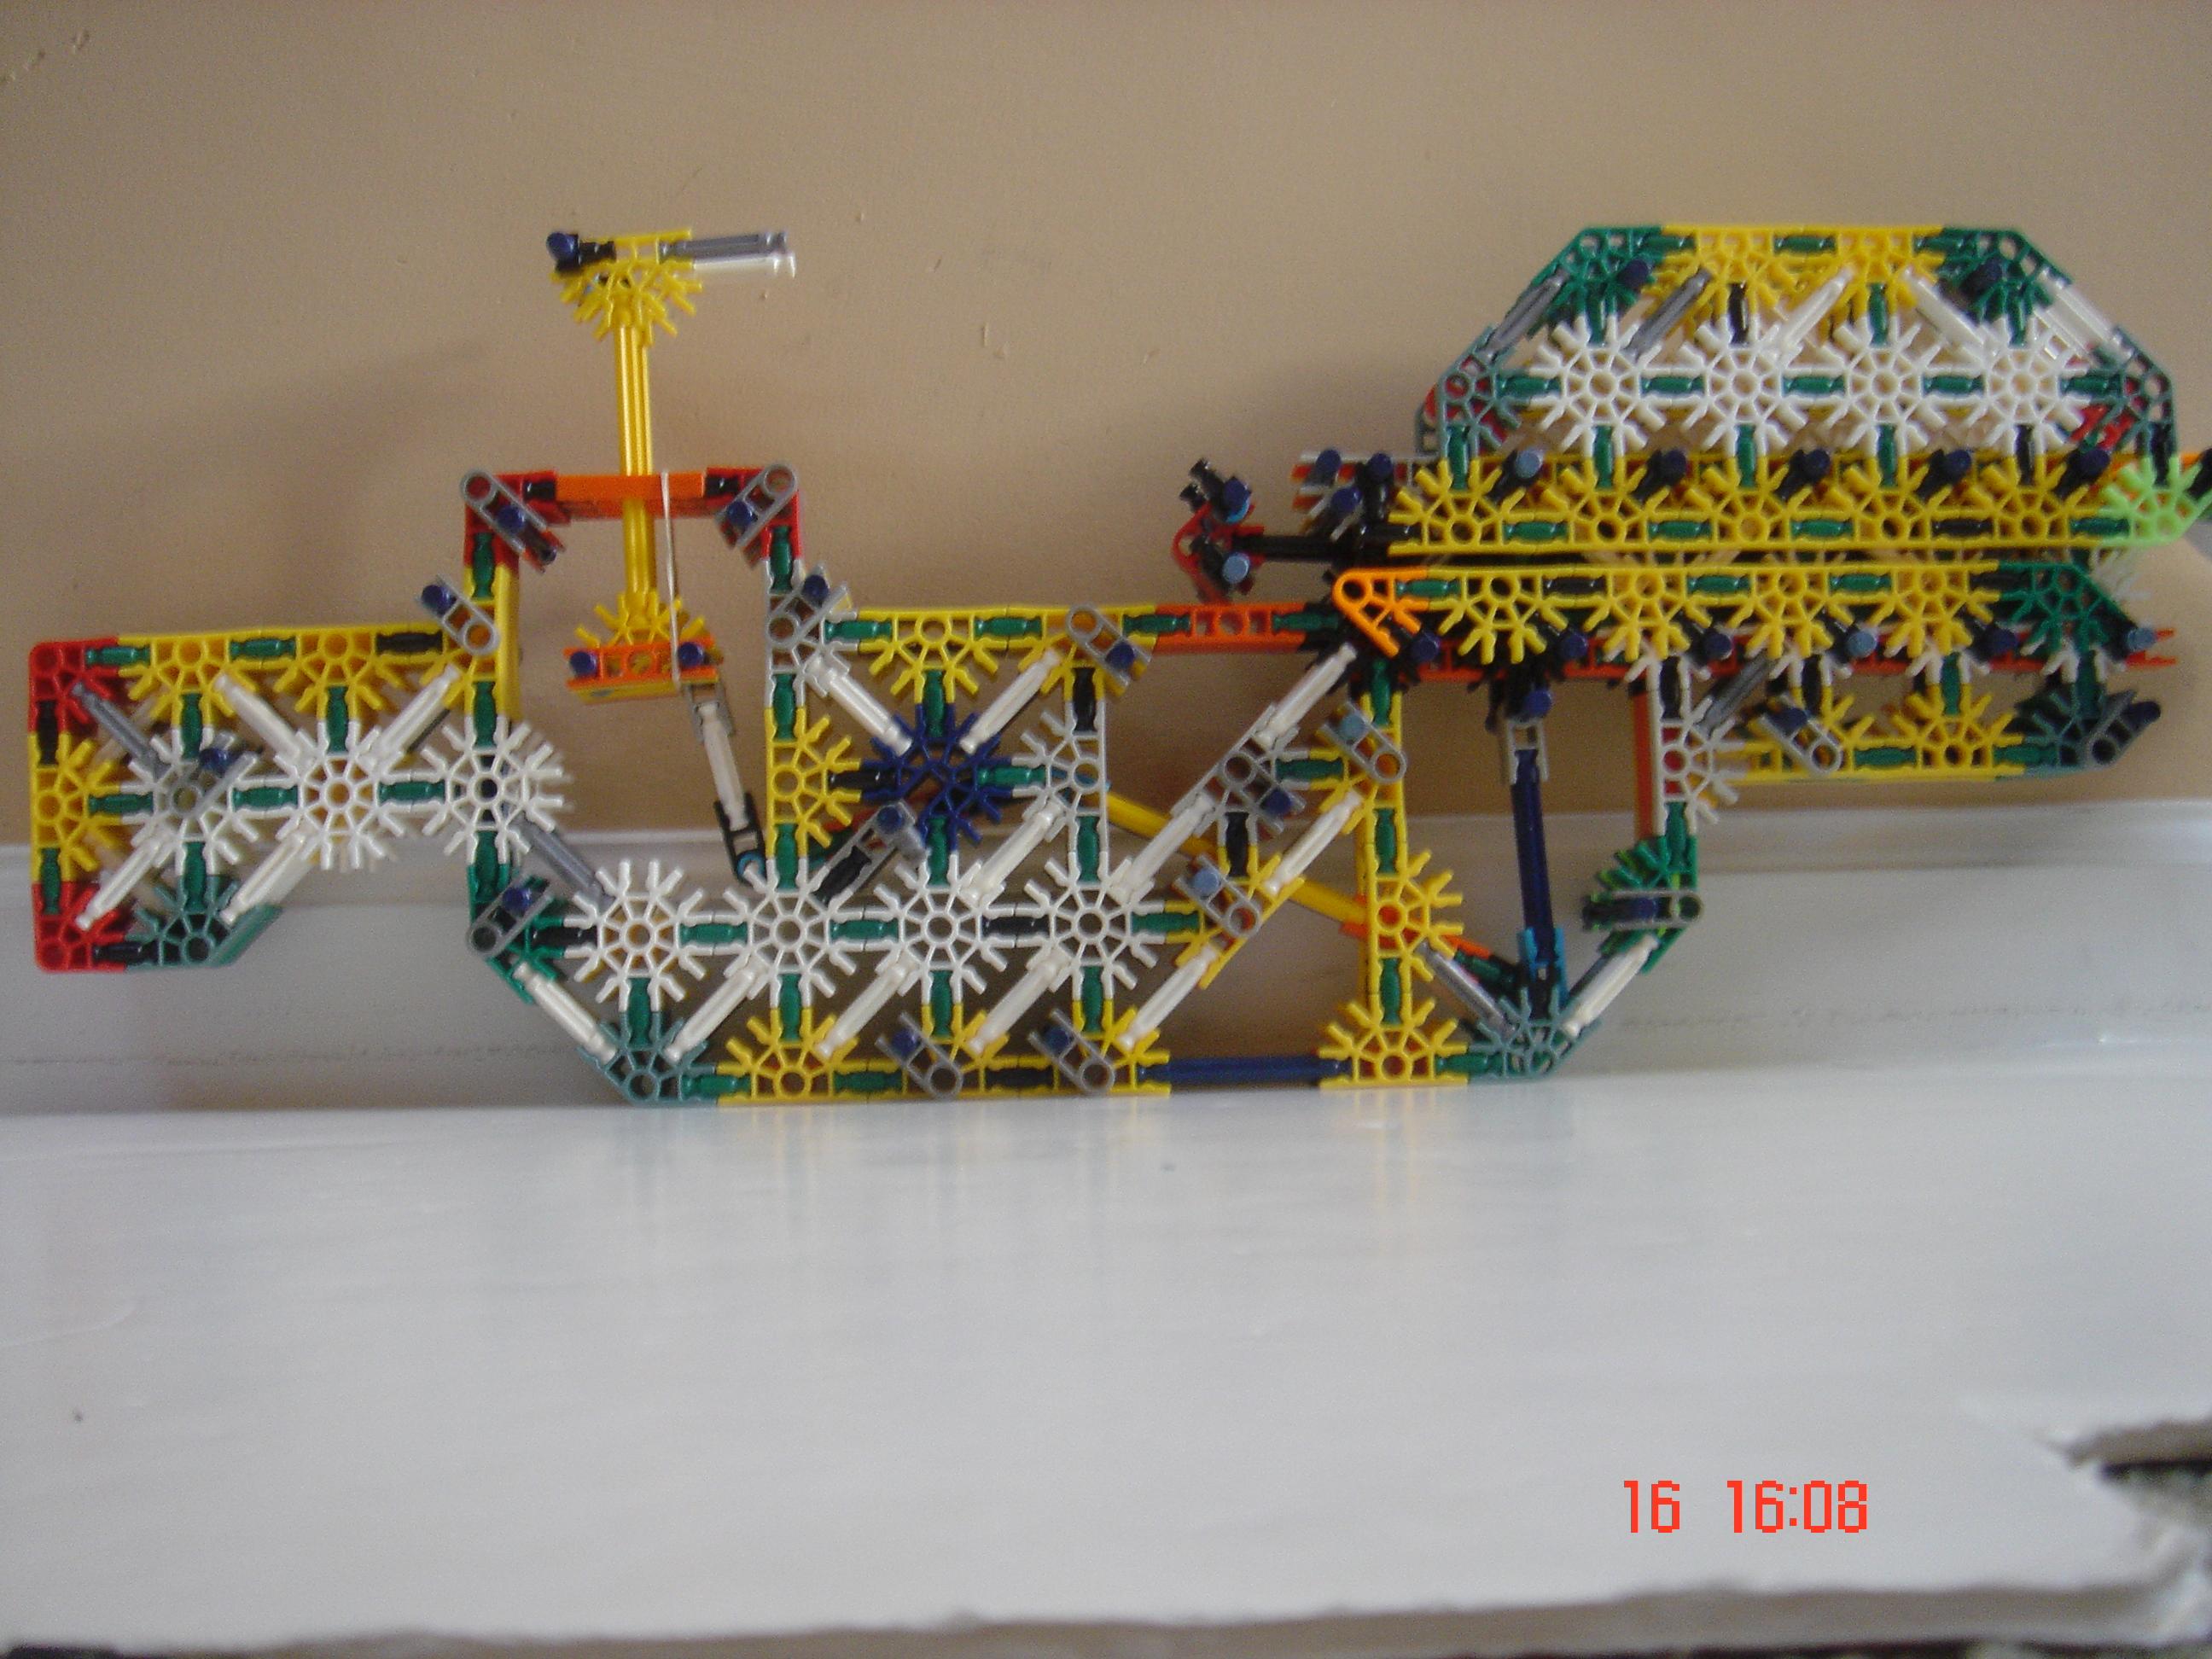 The X288 SERPENT